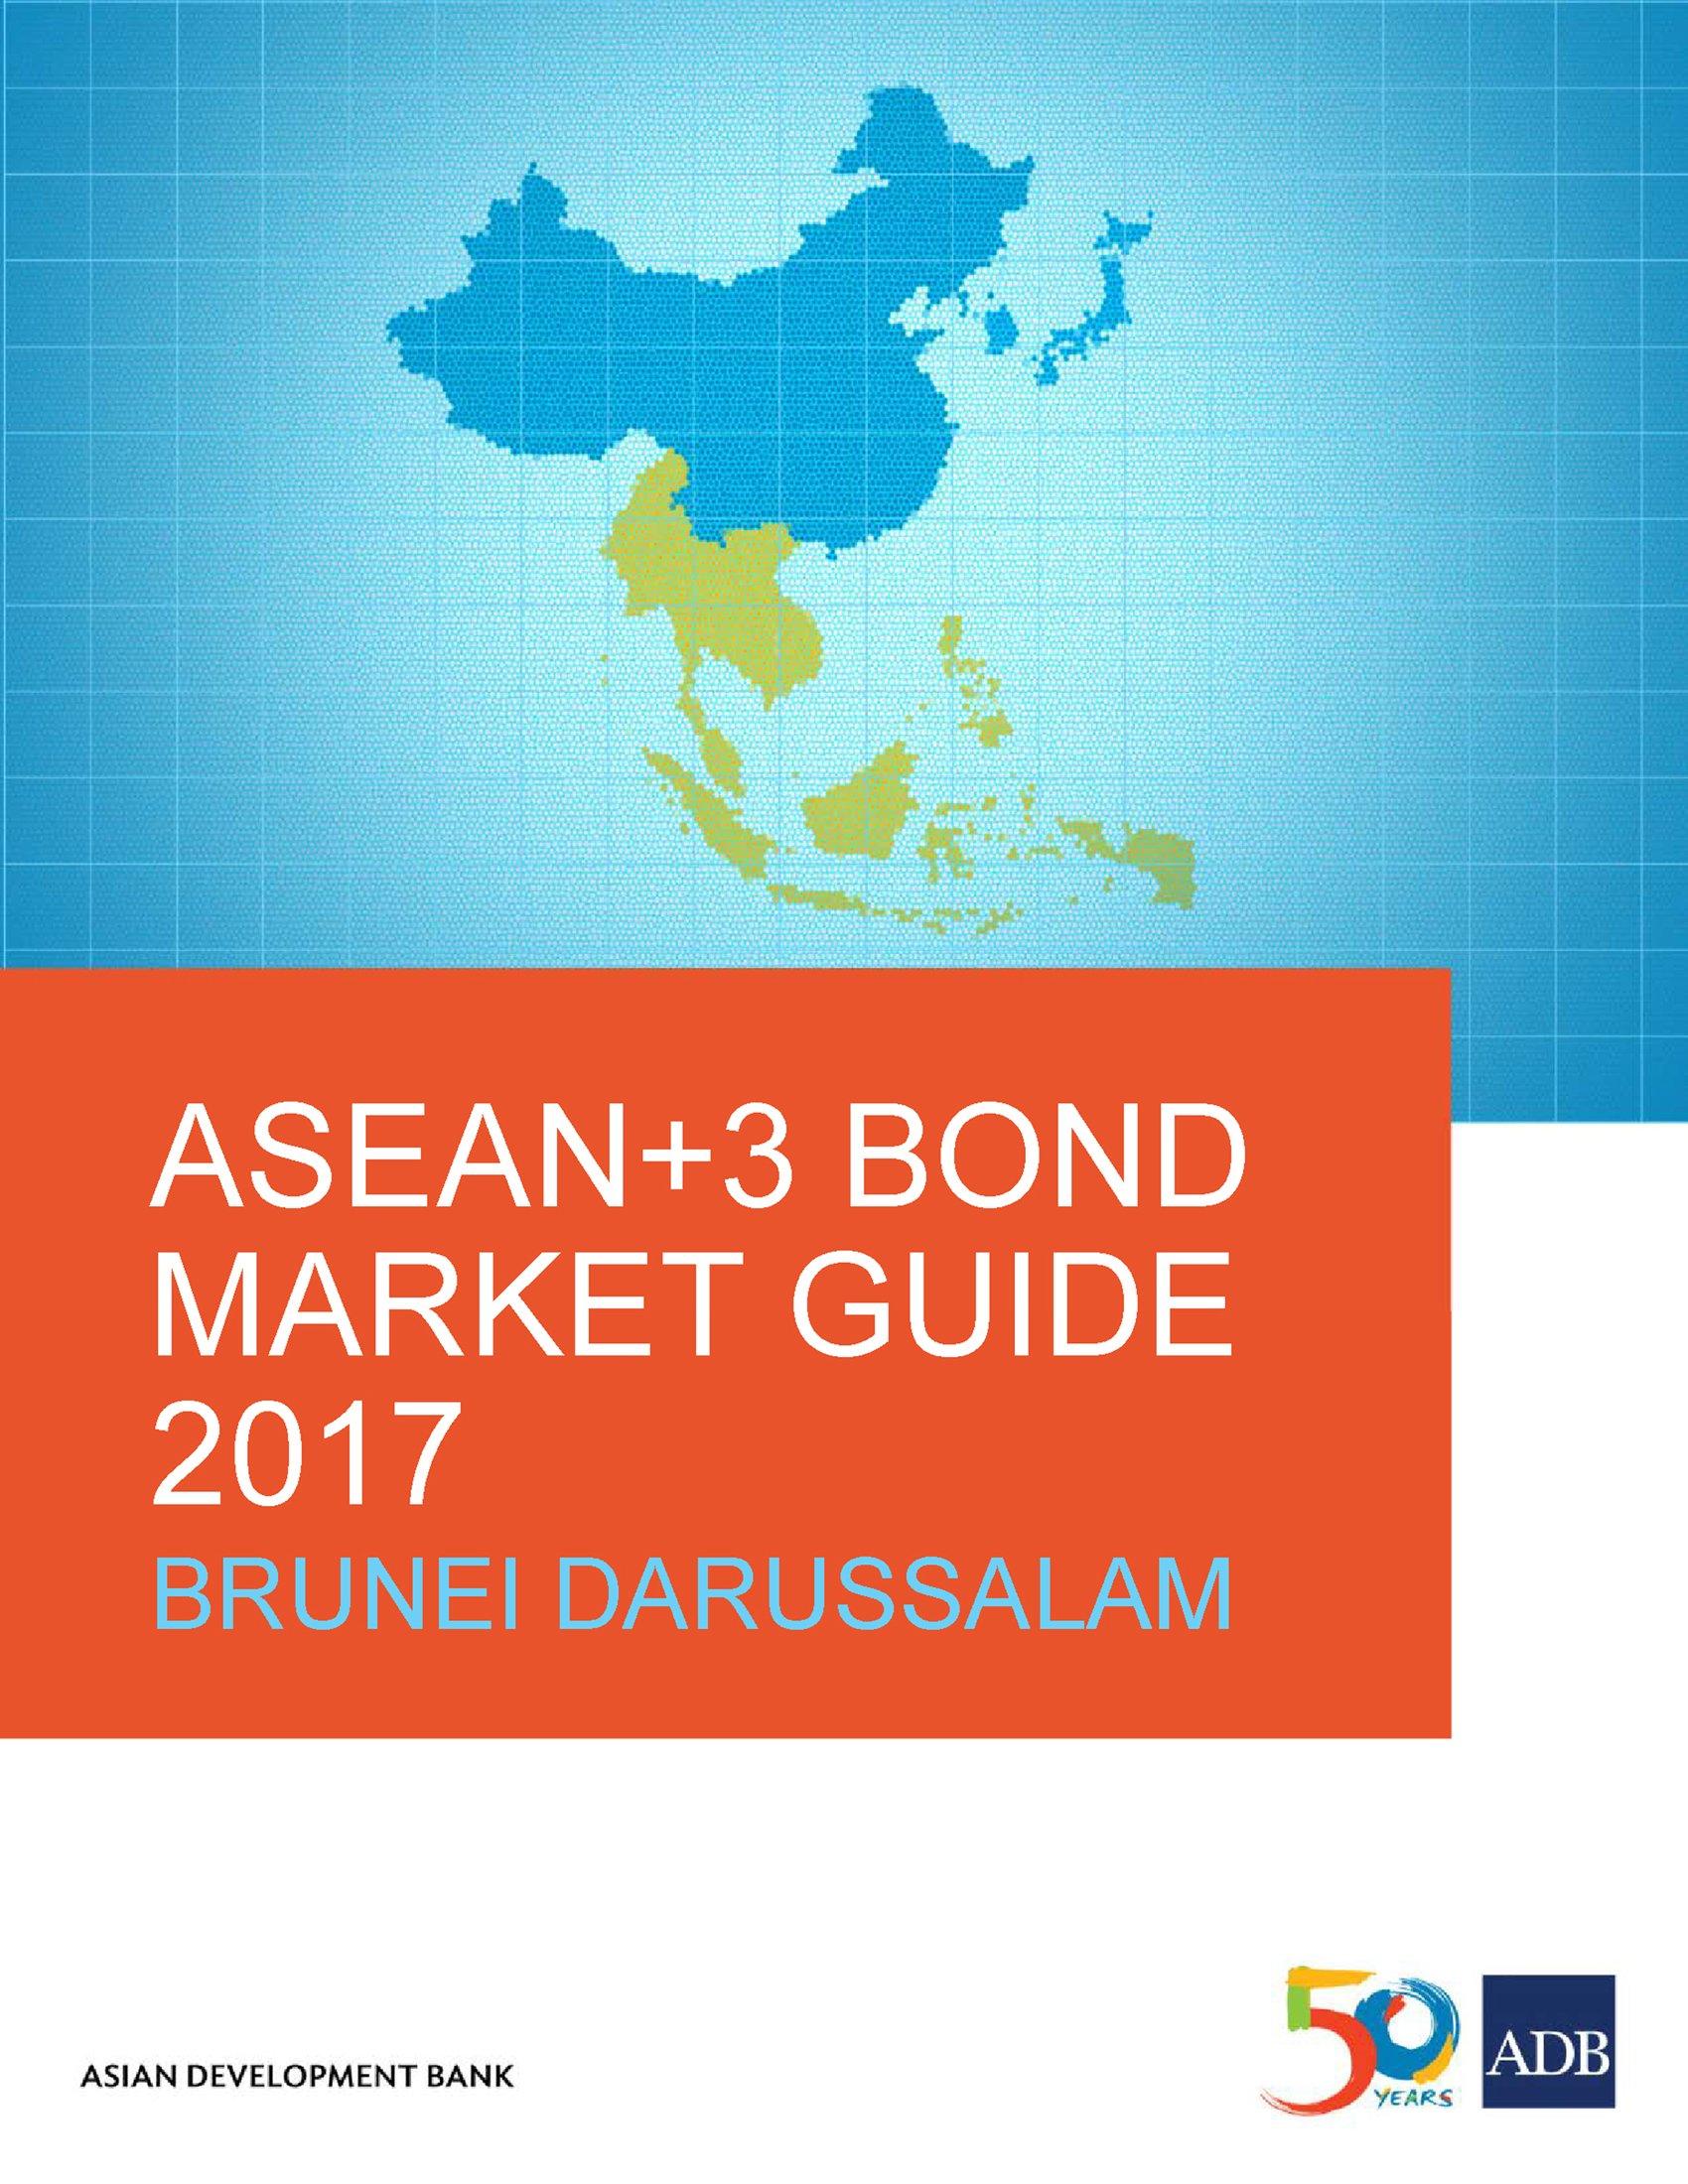 ASEAN+3 Bond Market Guide 2017 Brunei Darussalam (ASEAN+3 Bond Market Guides)